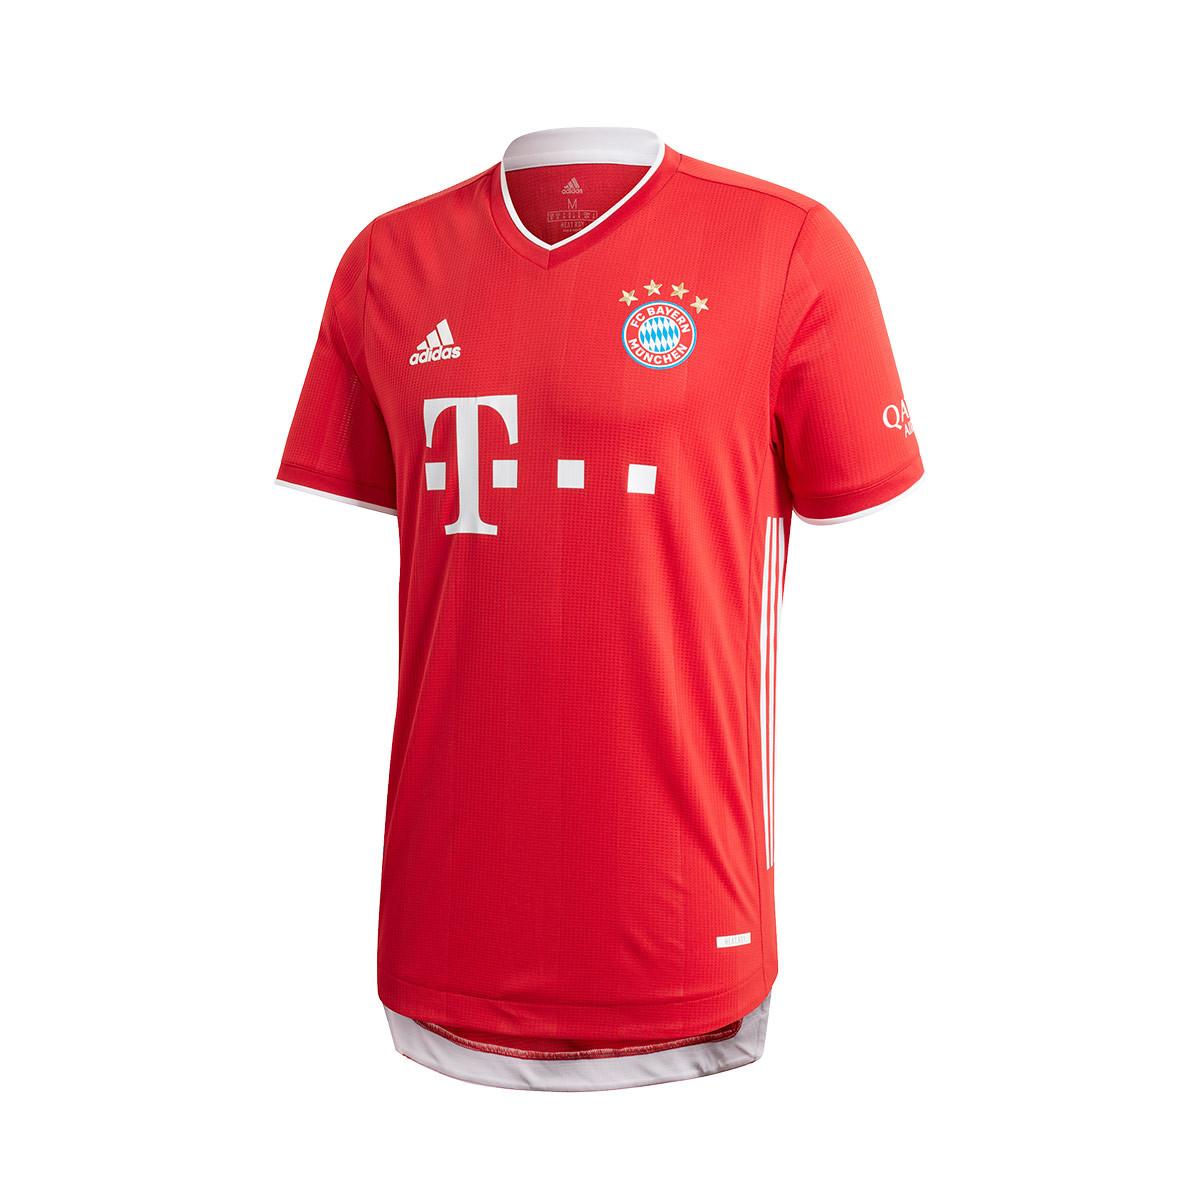 Camiseta adidas FC Bayern Munich Primera Equipación Authentic 2020-2021 True red - Fútbol Emotion